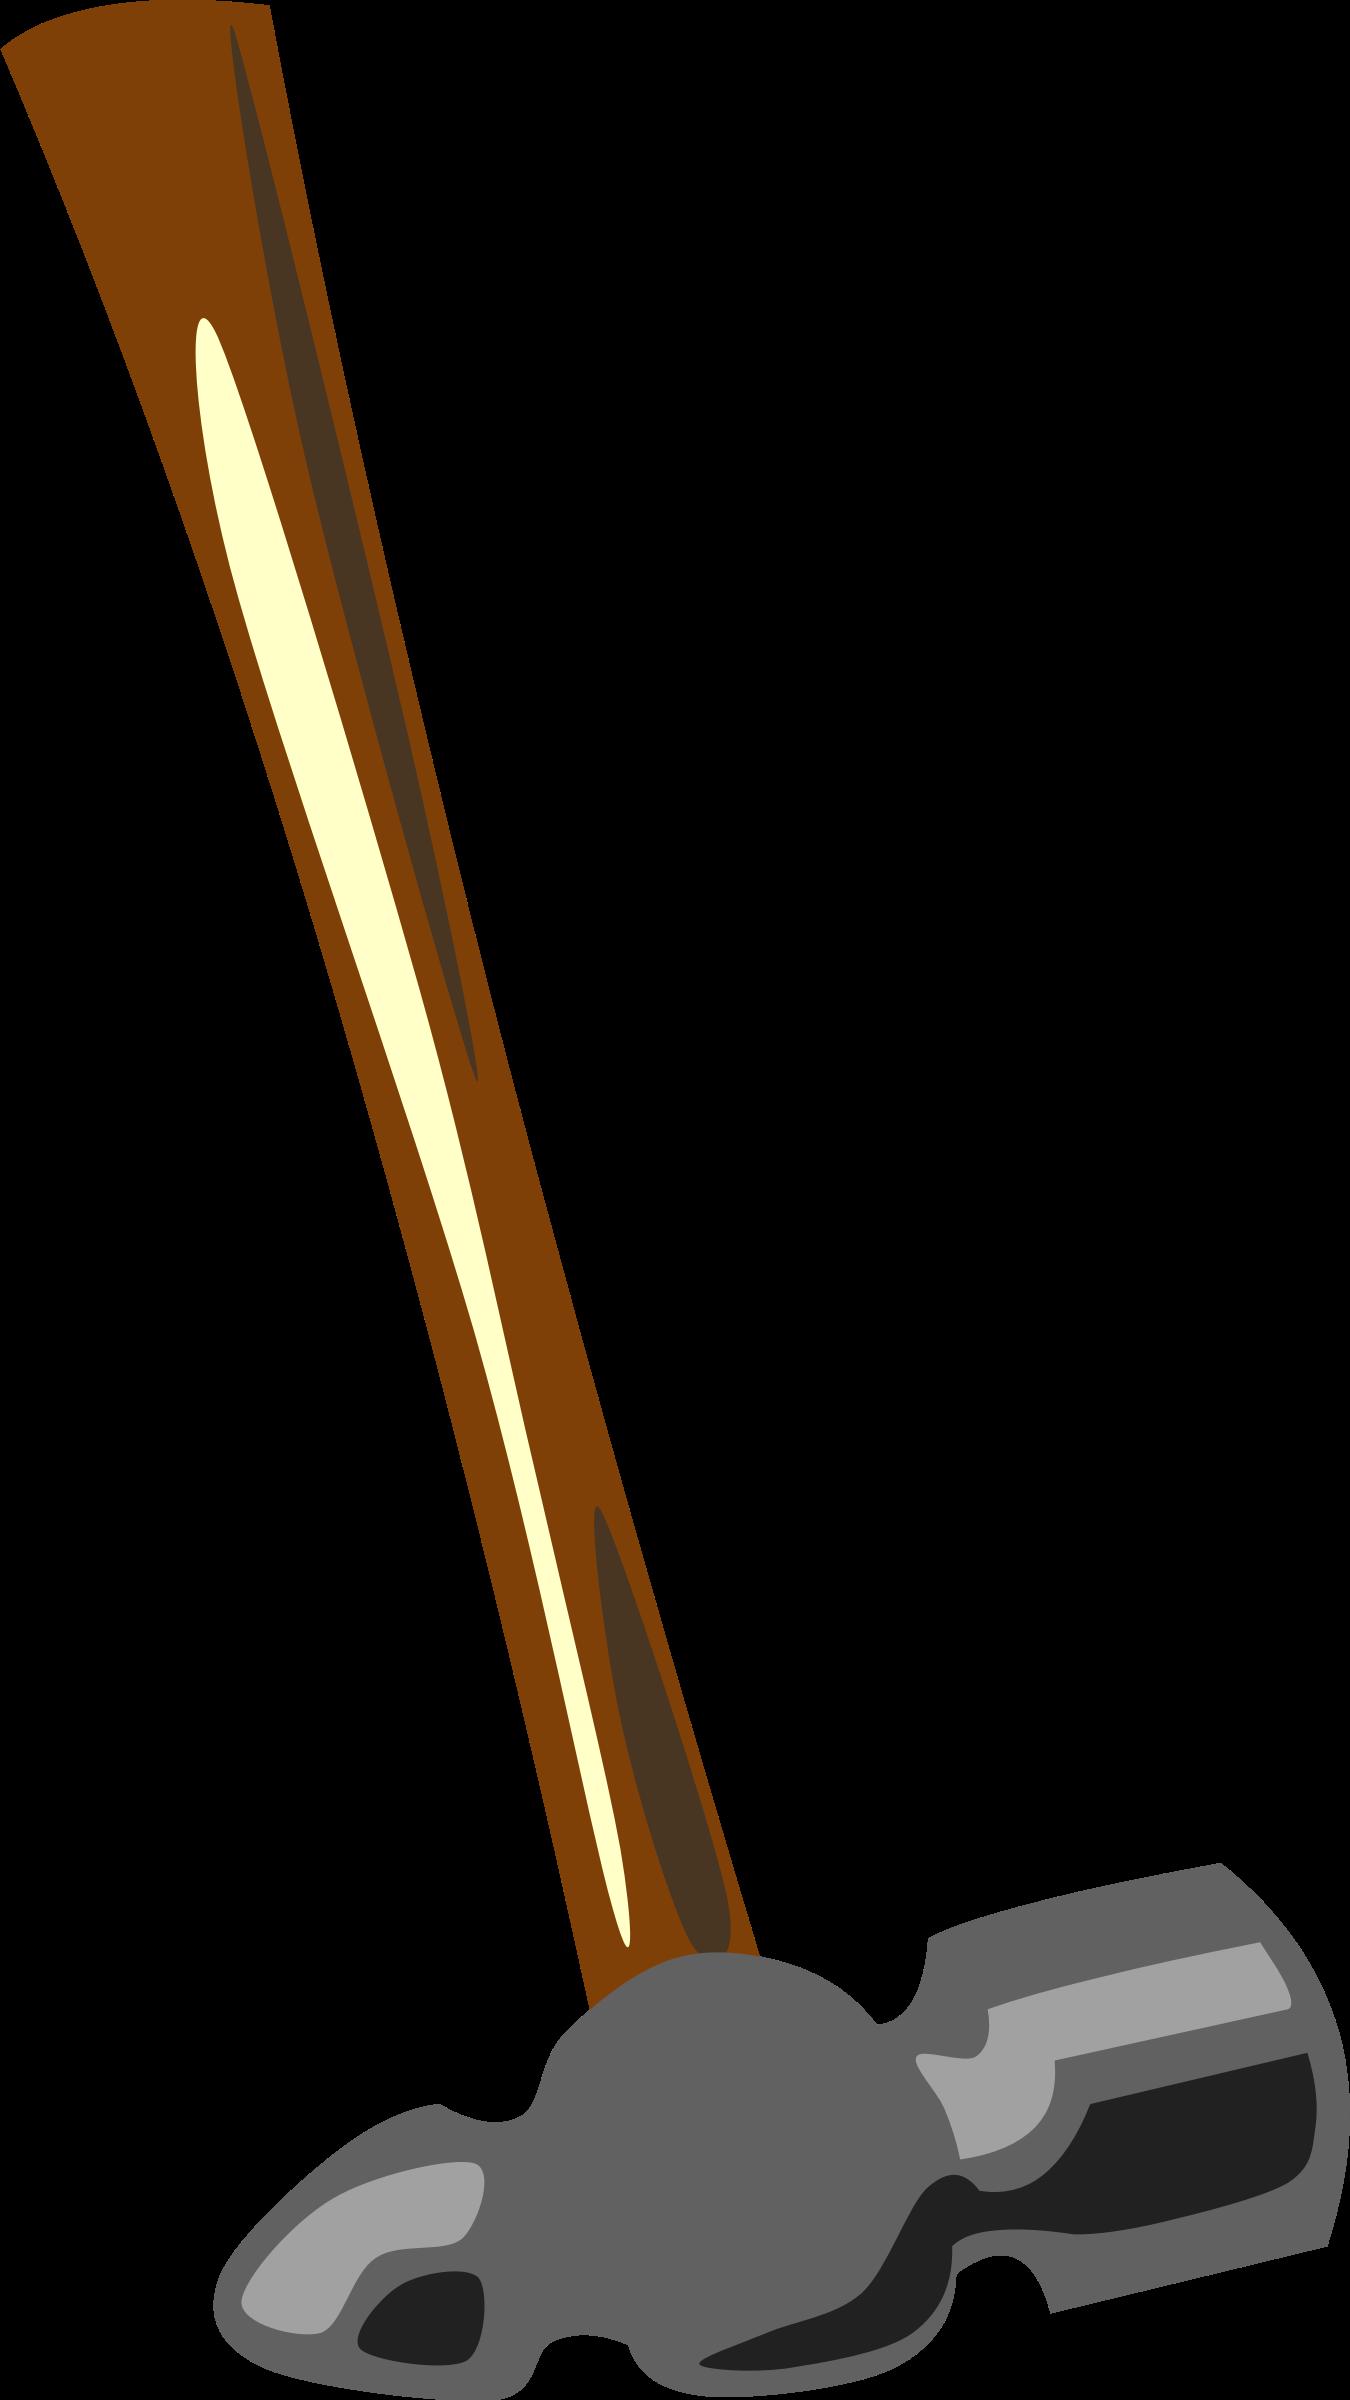 Blacksmith and tools big. Hammer clipart ball